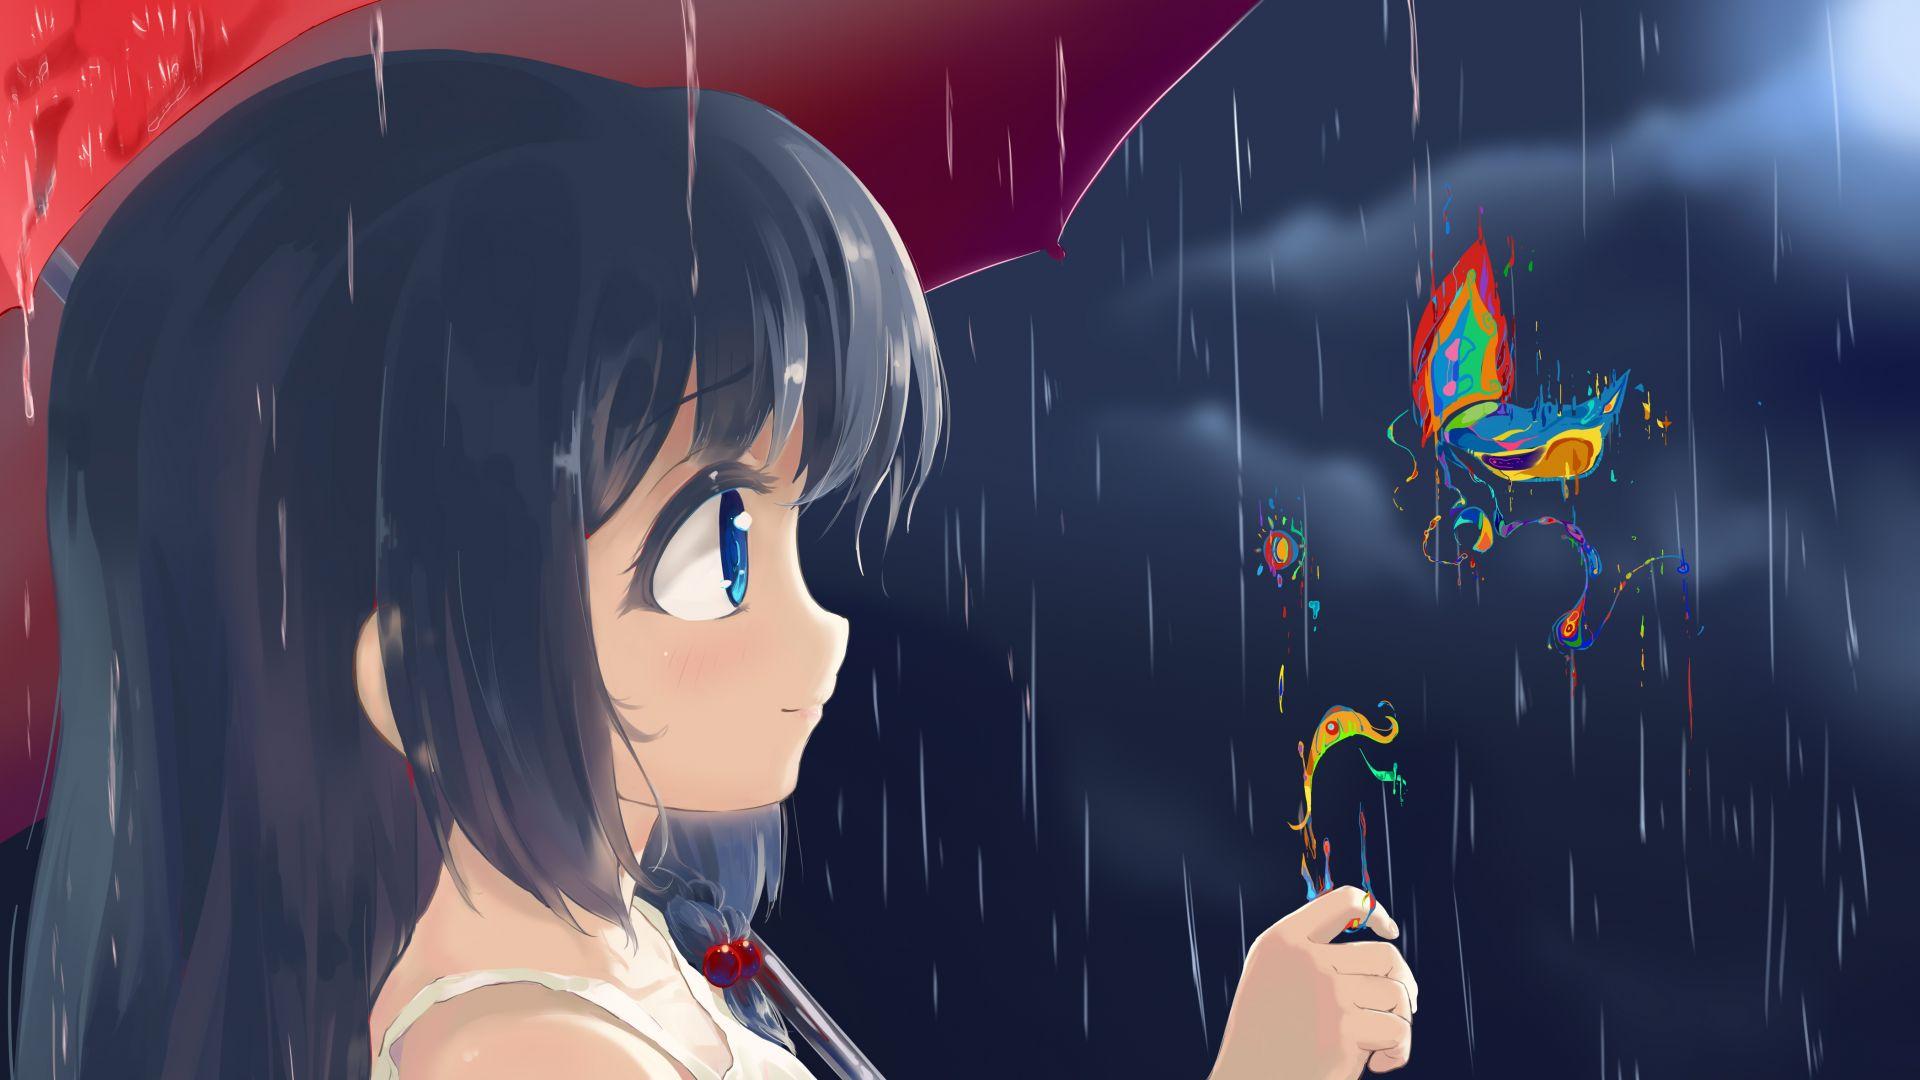 Rain Anime Girl Original Butterfly Wallpaper